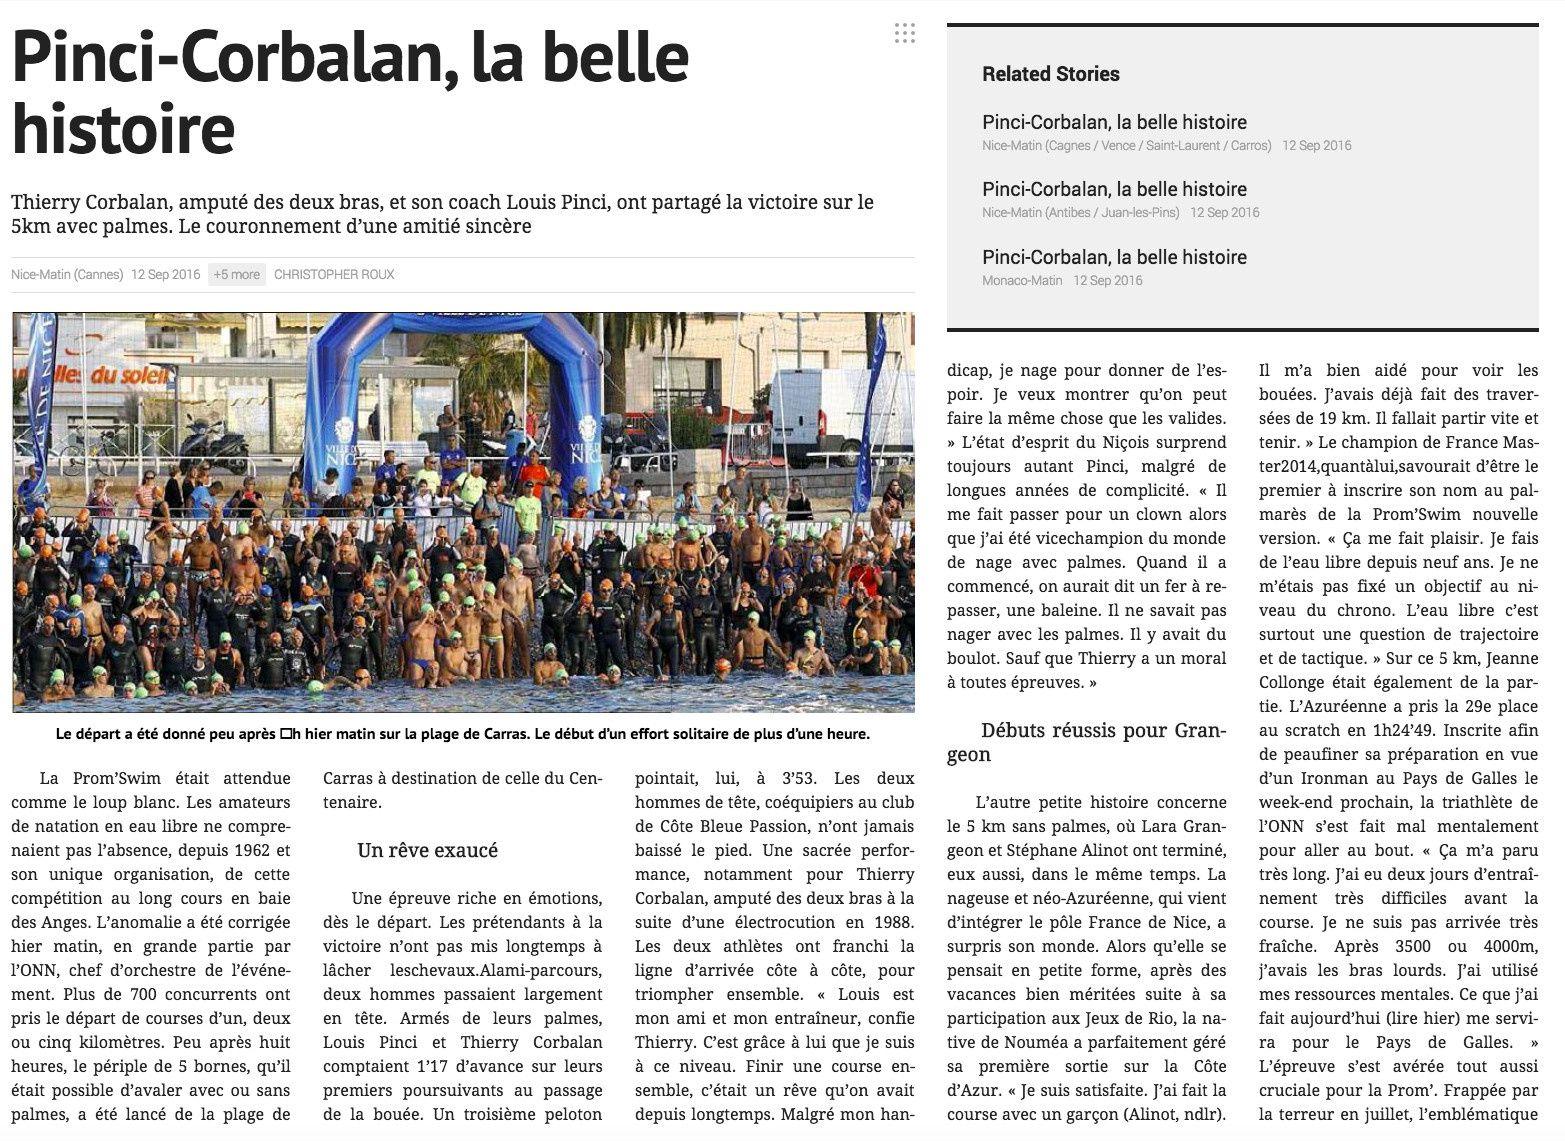 Pinci-Corbalan la belle histoire.